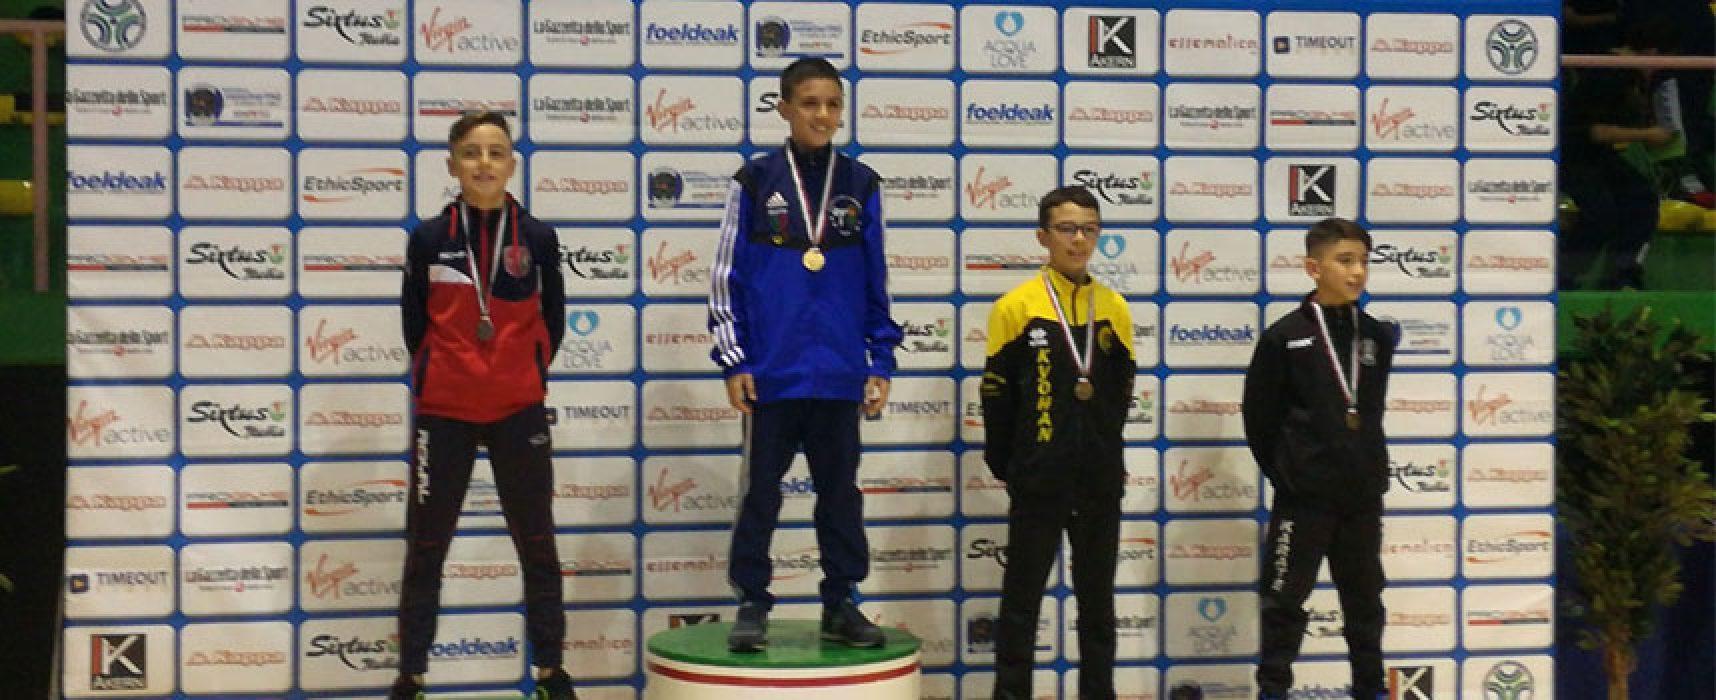 Bronzo per Federico Papagni ai Campionati Italiani di karate